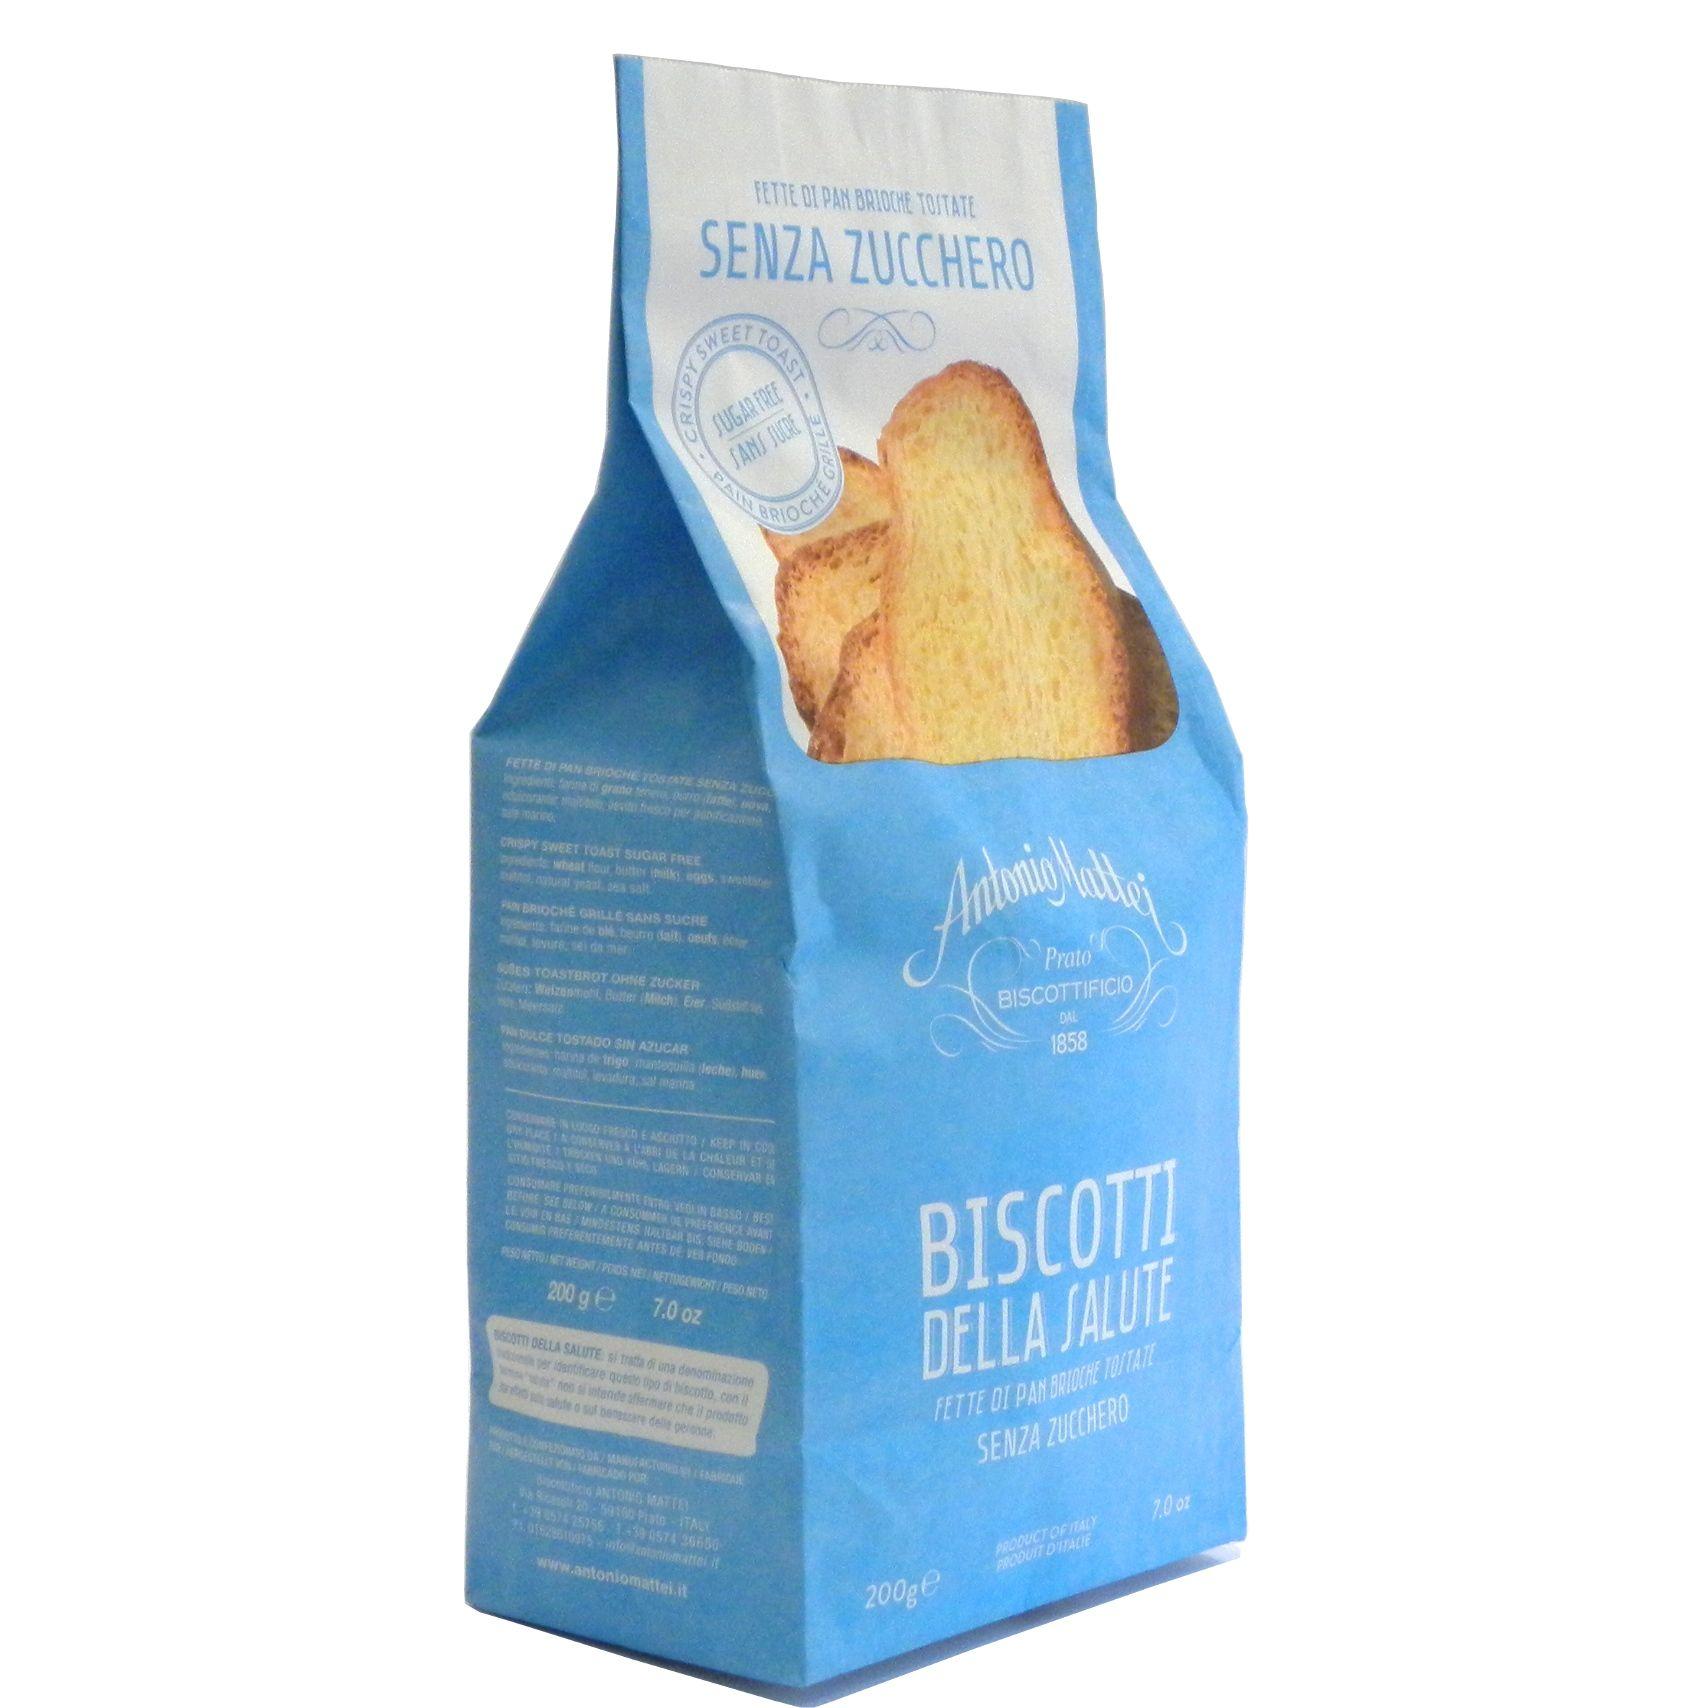 Biscotti Salute senza zucchero Mattei – Gustorotondo – Italian food boutique